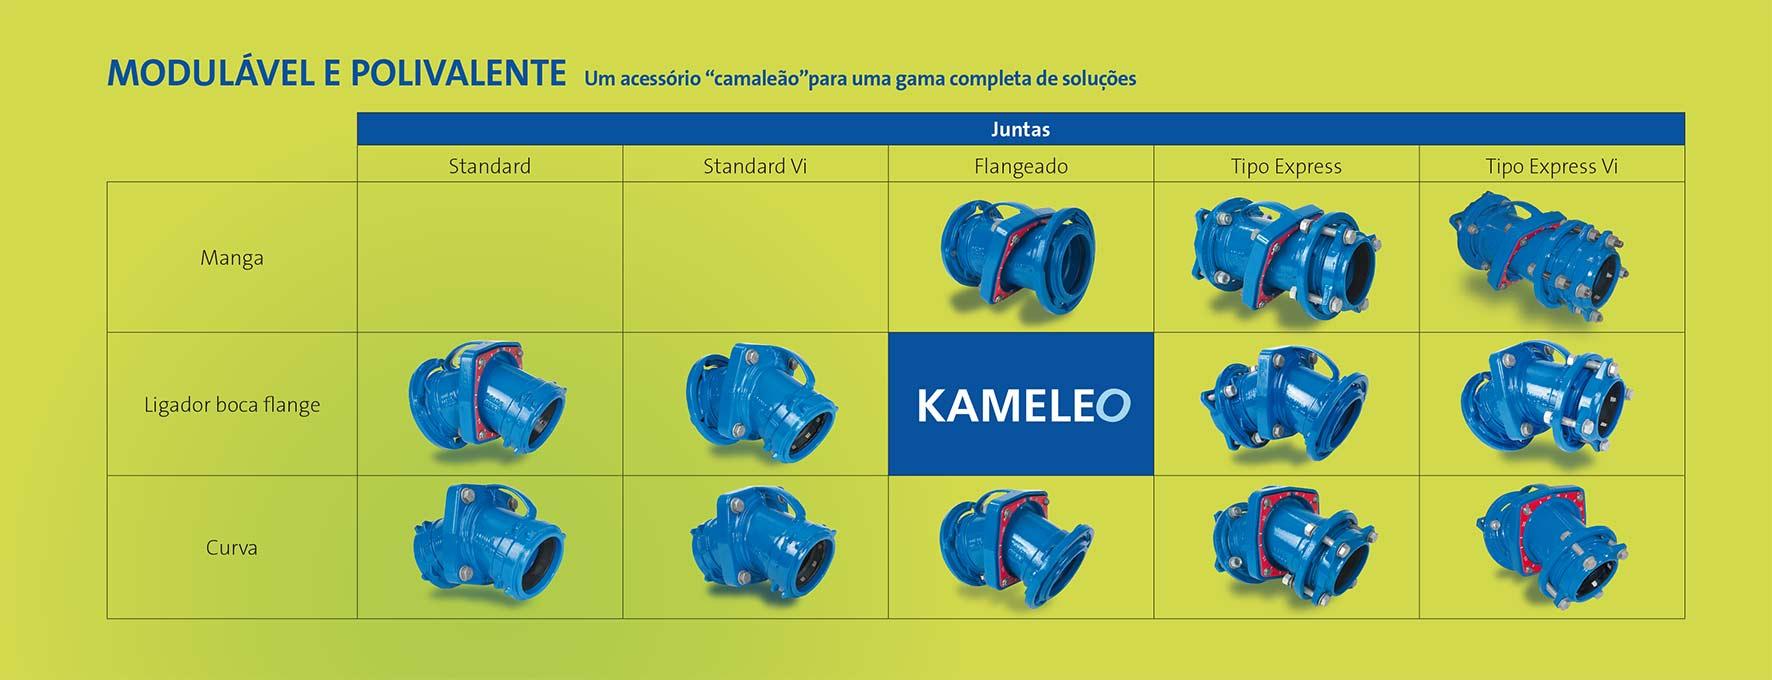 Uma gama completa - Kameleo - Saint-Gobain PAM